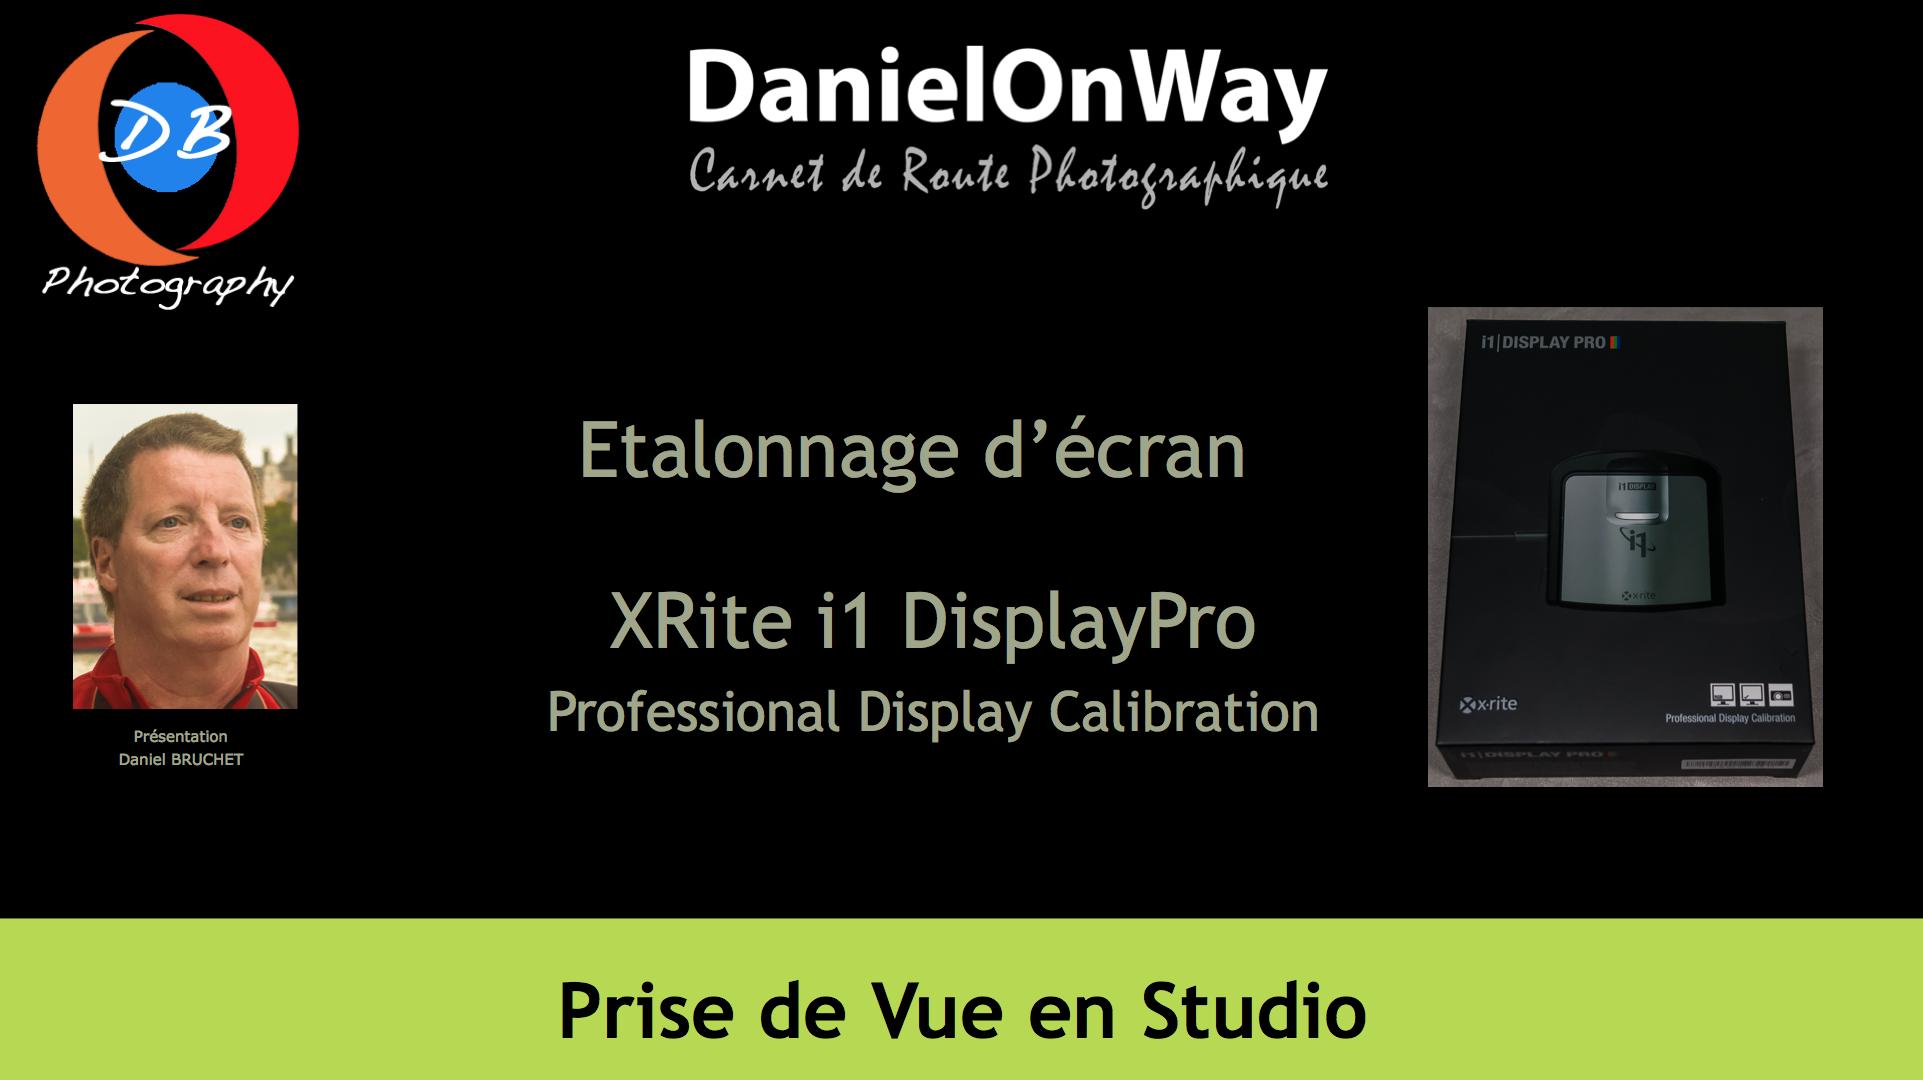 i1 Display Pro